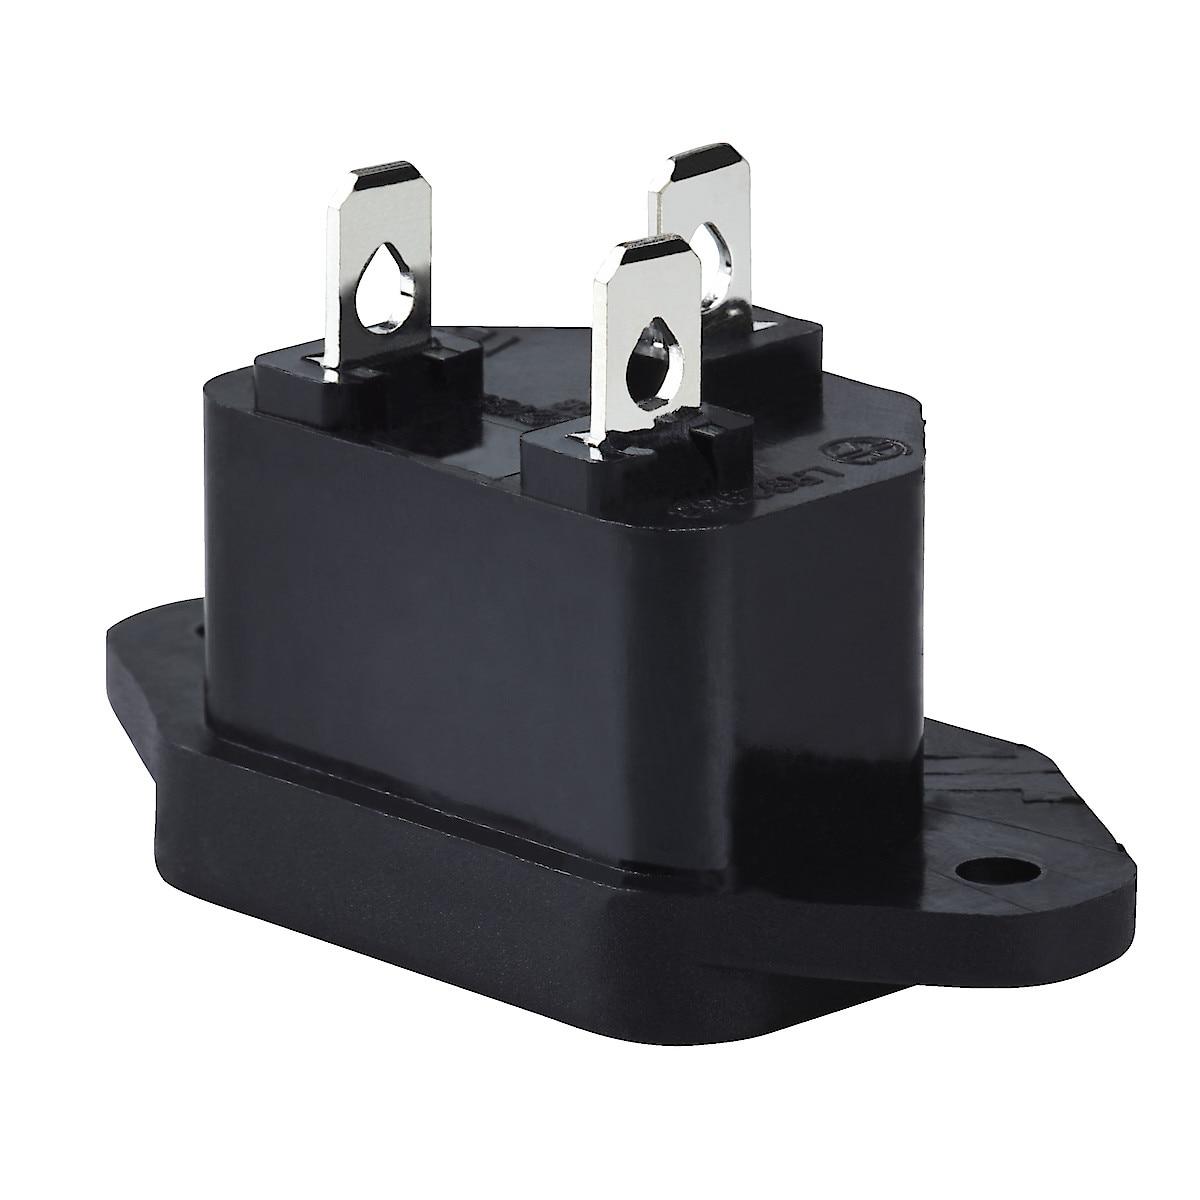 Apparatintag IEC320 C14